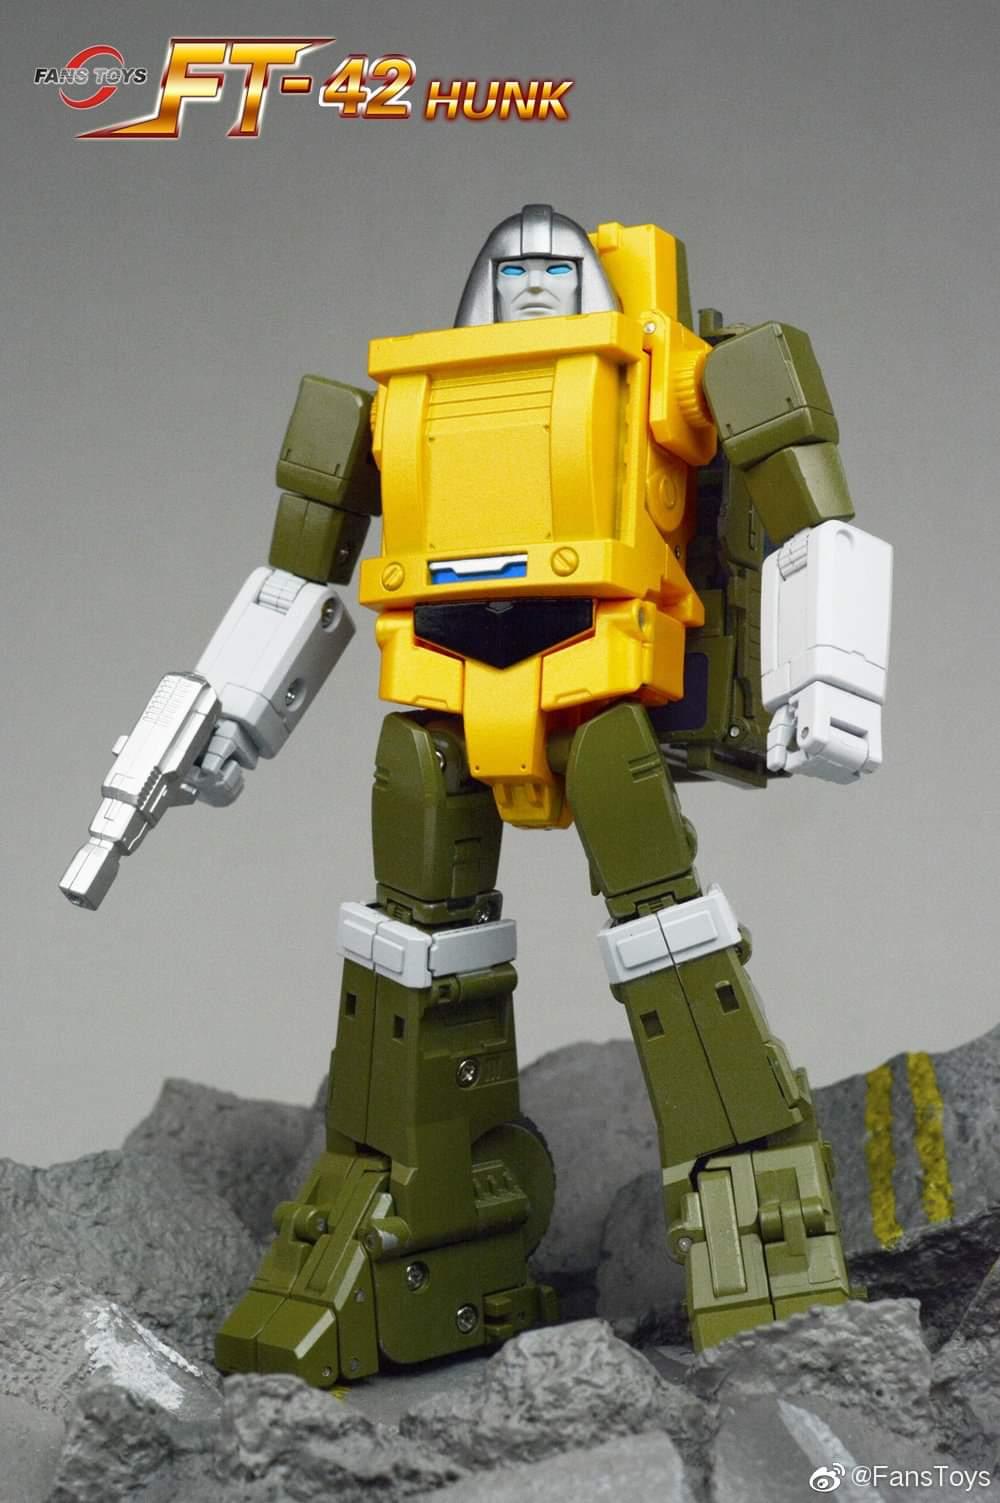 [Fanstoys] Produit Tiers - Minibots MP - Gamme FT - Page 3 Hsd1KoGW_o